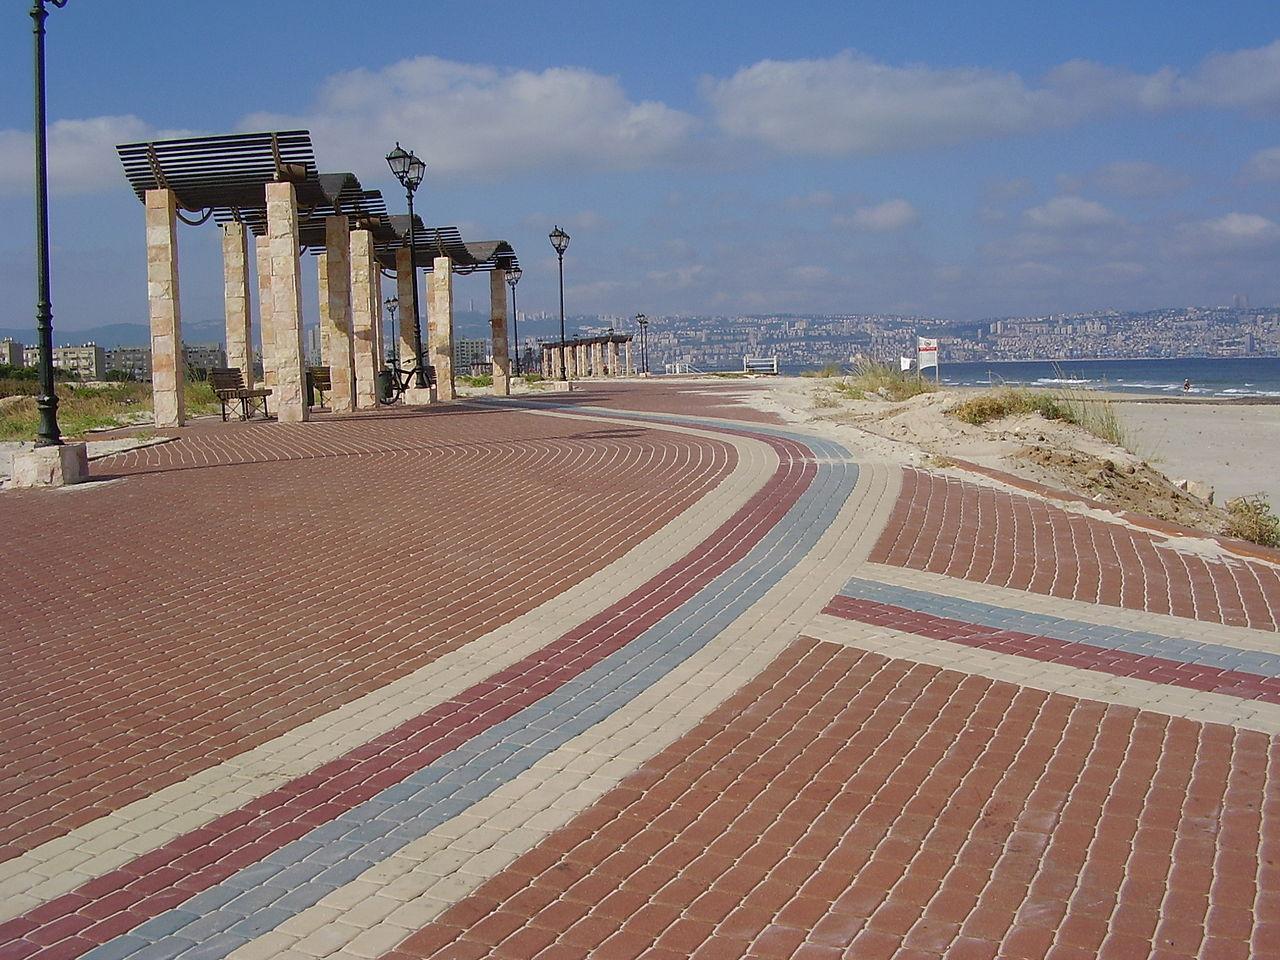 1280px-PikiWiki_Israel_13486_Kiryat_Yam_Beach